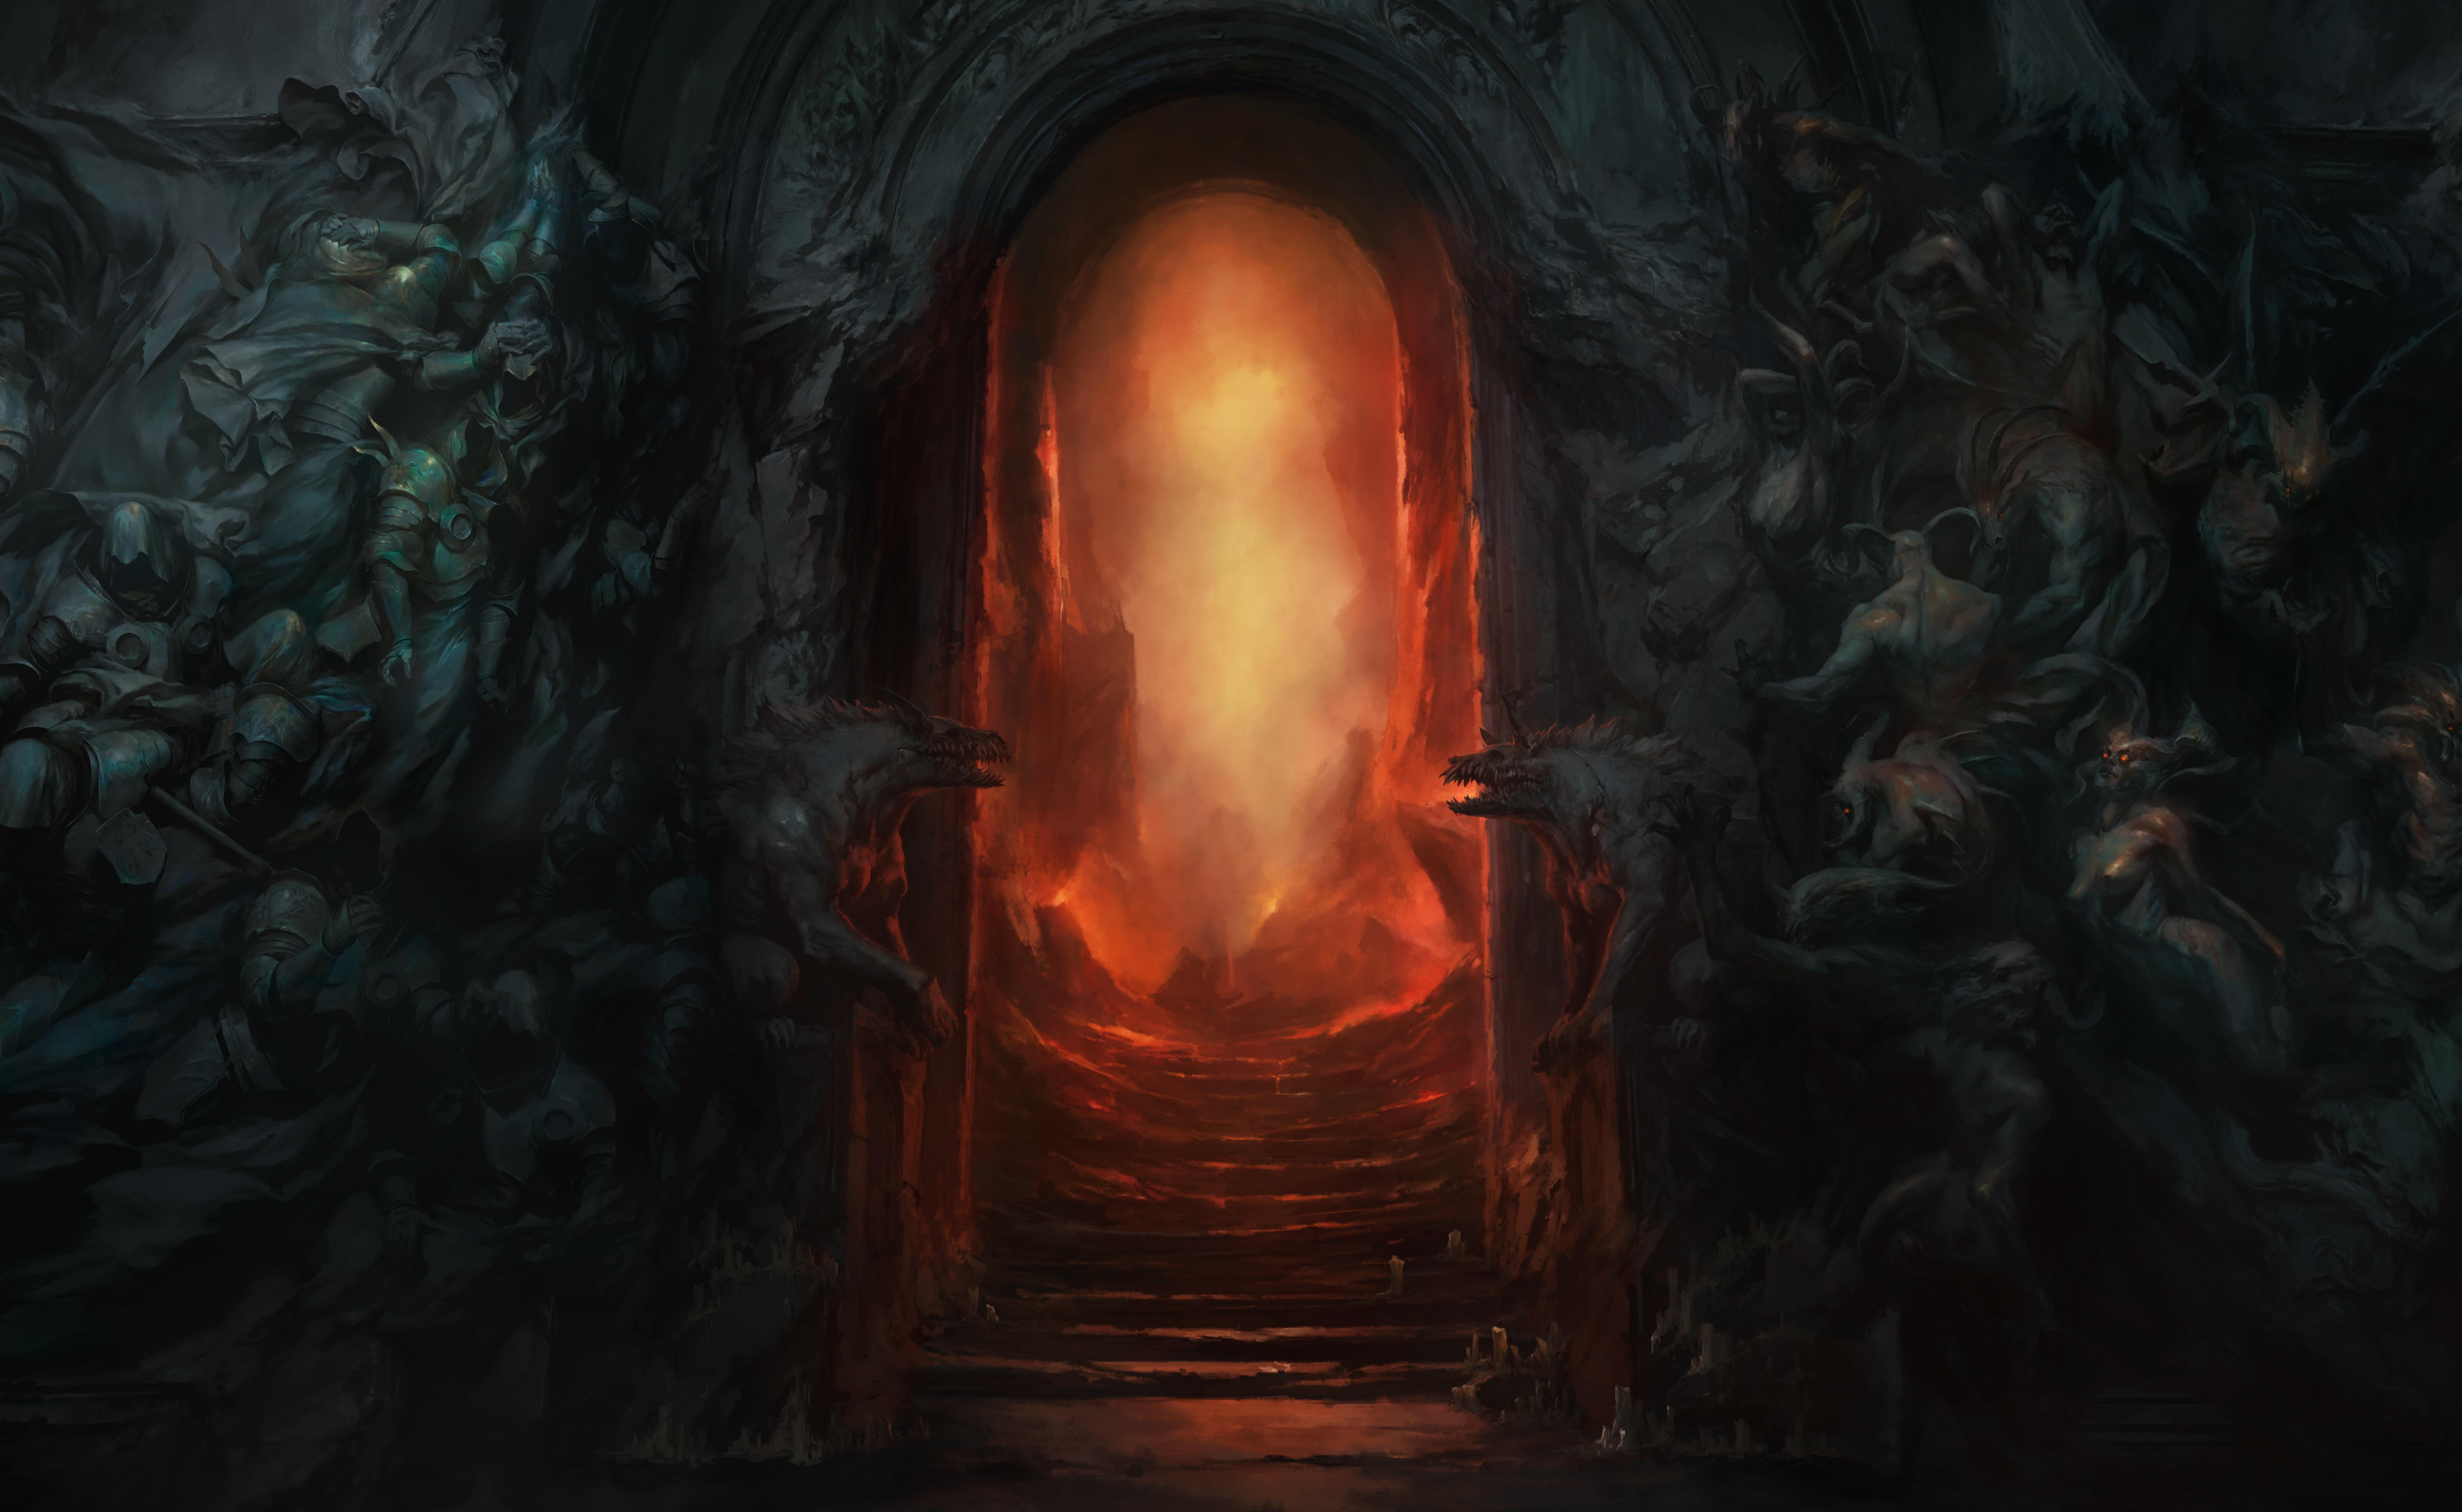 General 8949x5496 digital art artwork video games video game art diablo iv Diablo Blizzard Entertainment gates Hellgate diablo 4